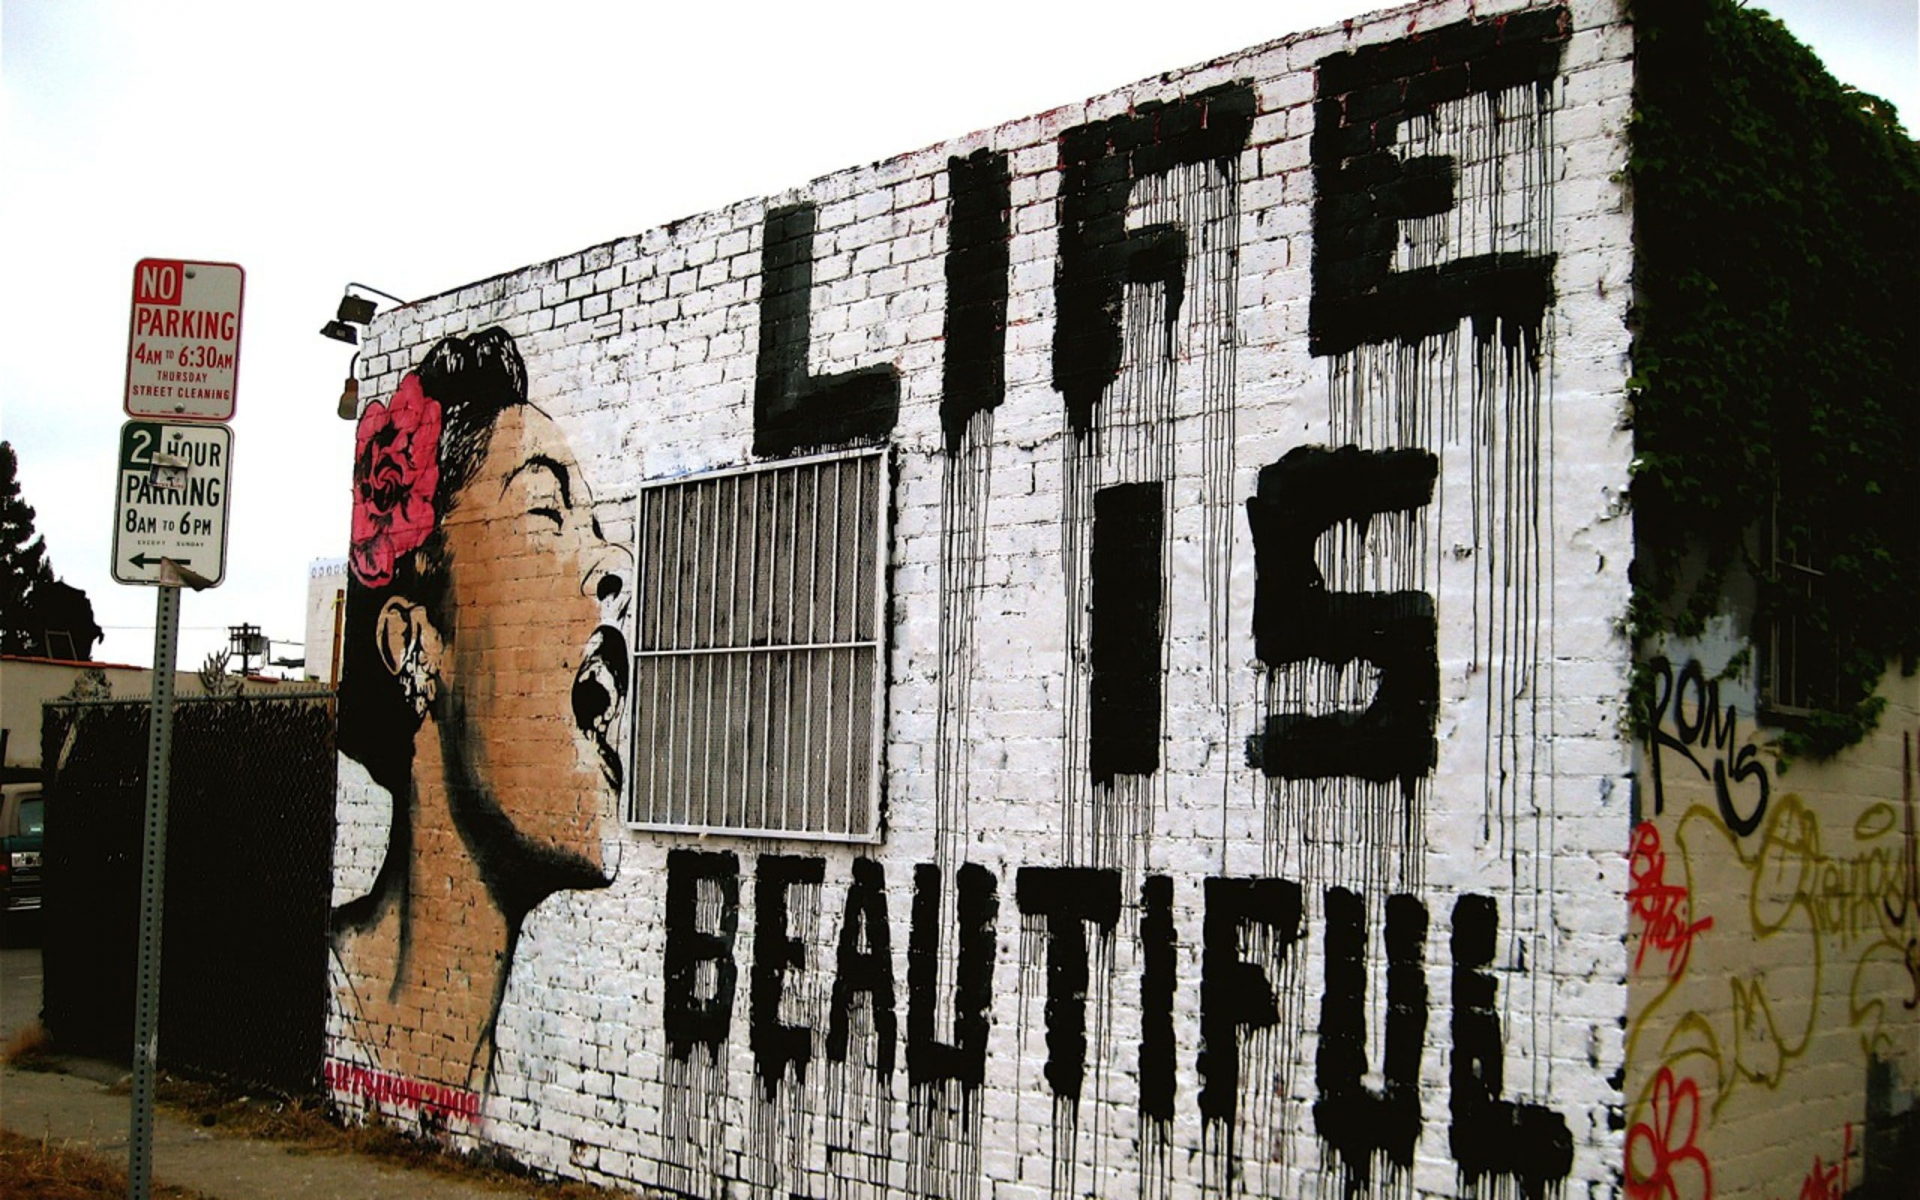 urban art graffiti mood happy motivational inspiration women statement quote buildings paint. Black Bedroom Furniture Sets. Home Design Ideas